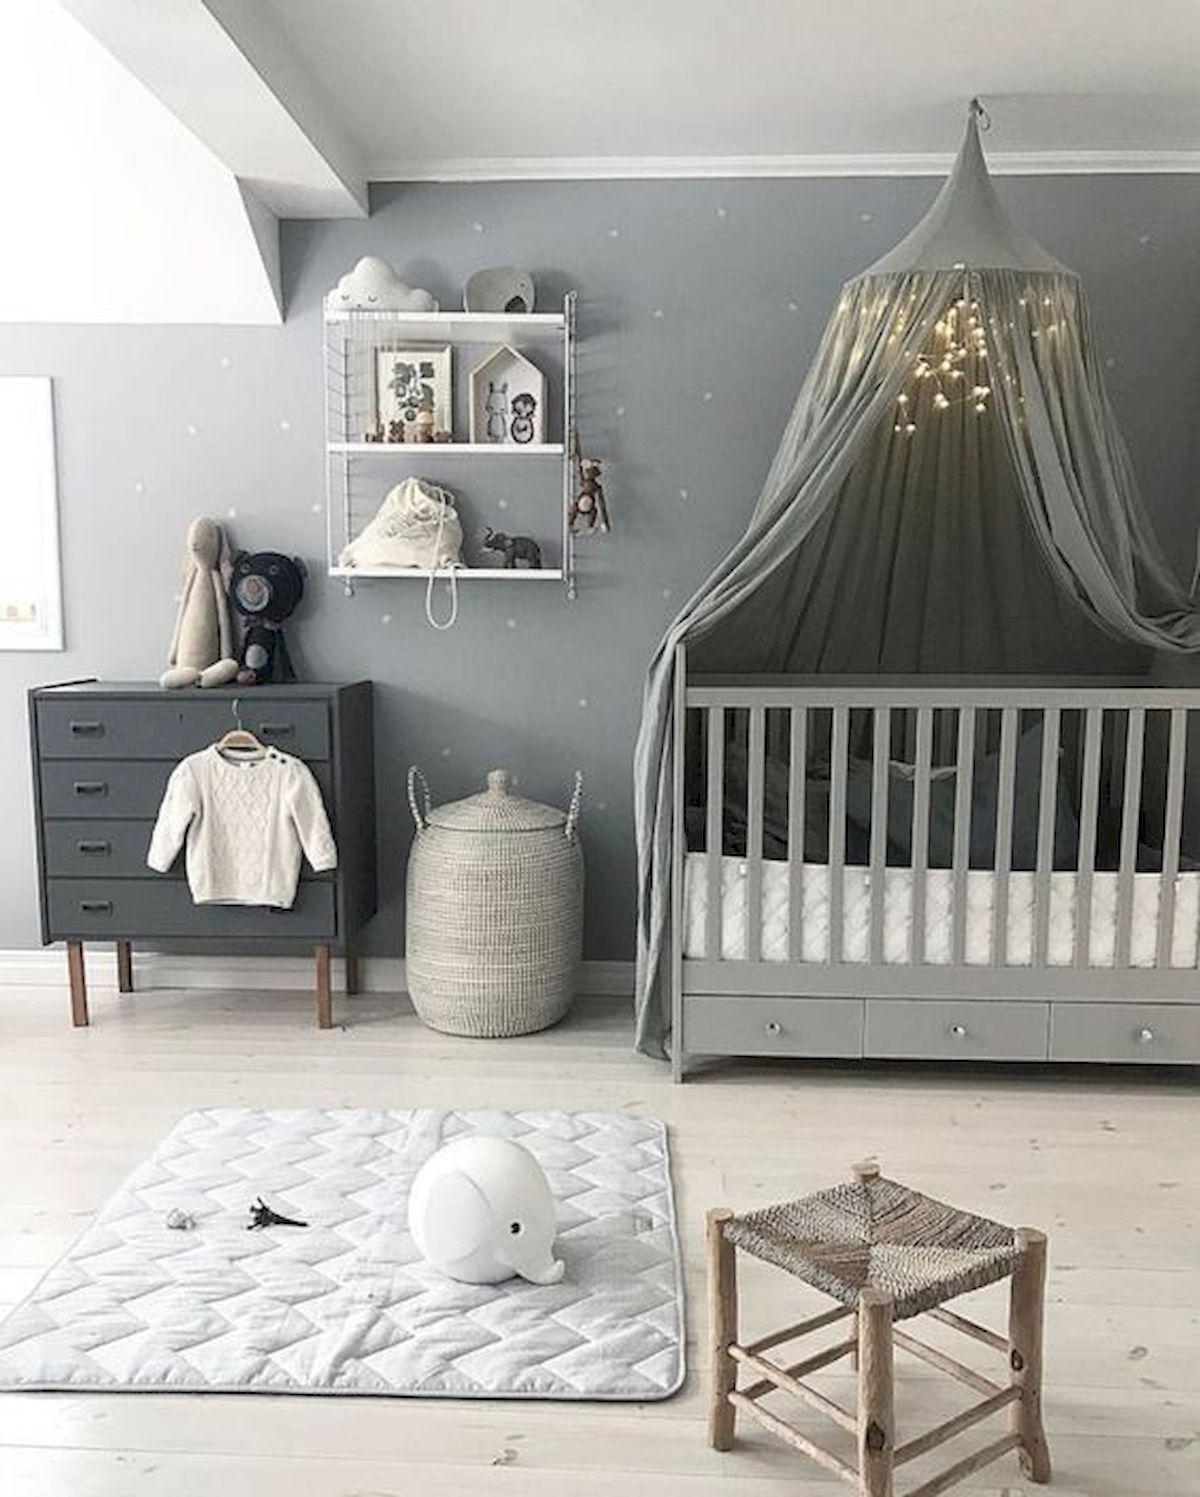 40 Adorable Neutral Nursery Room Ideas images